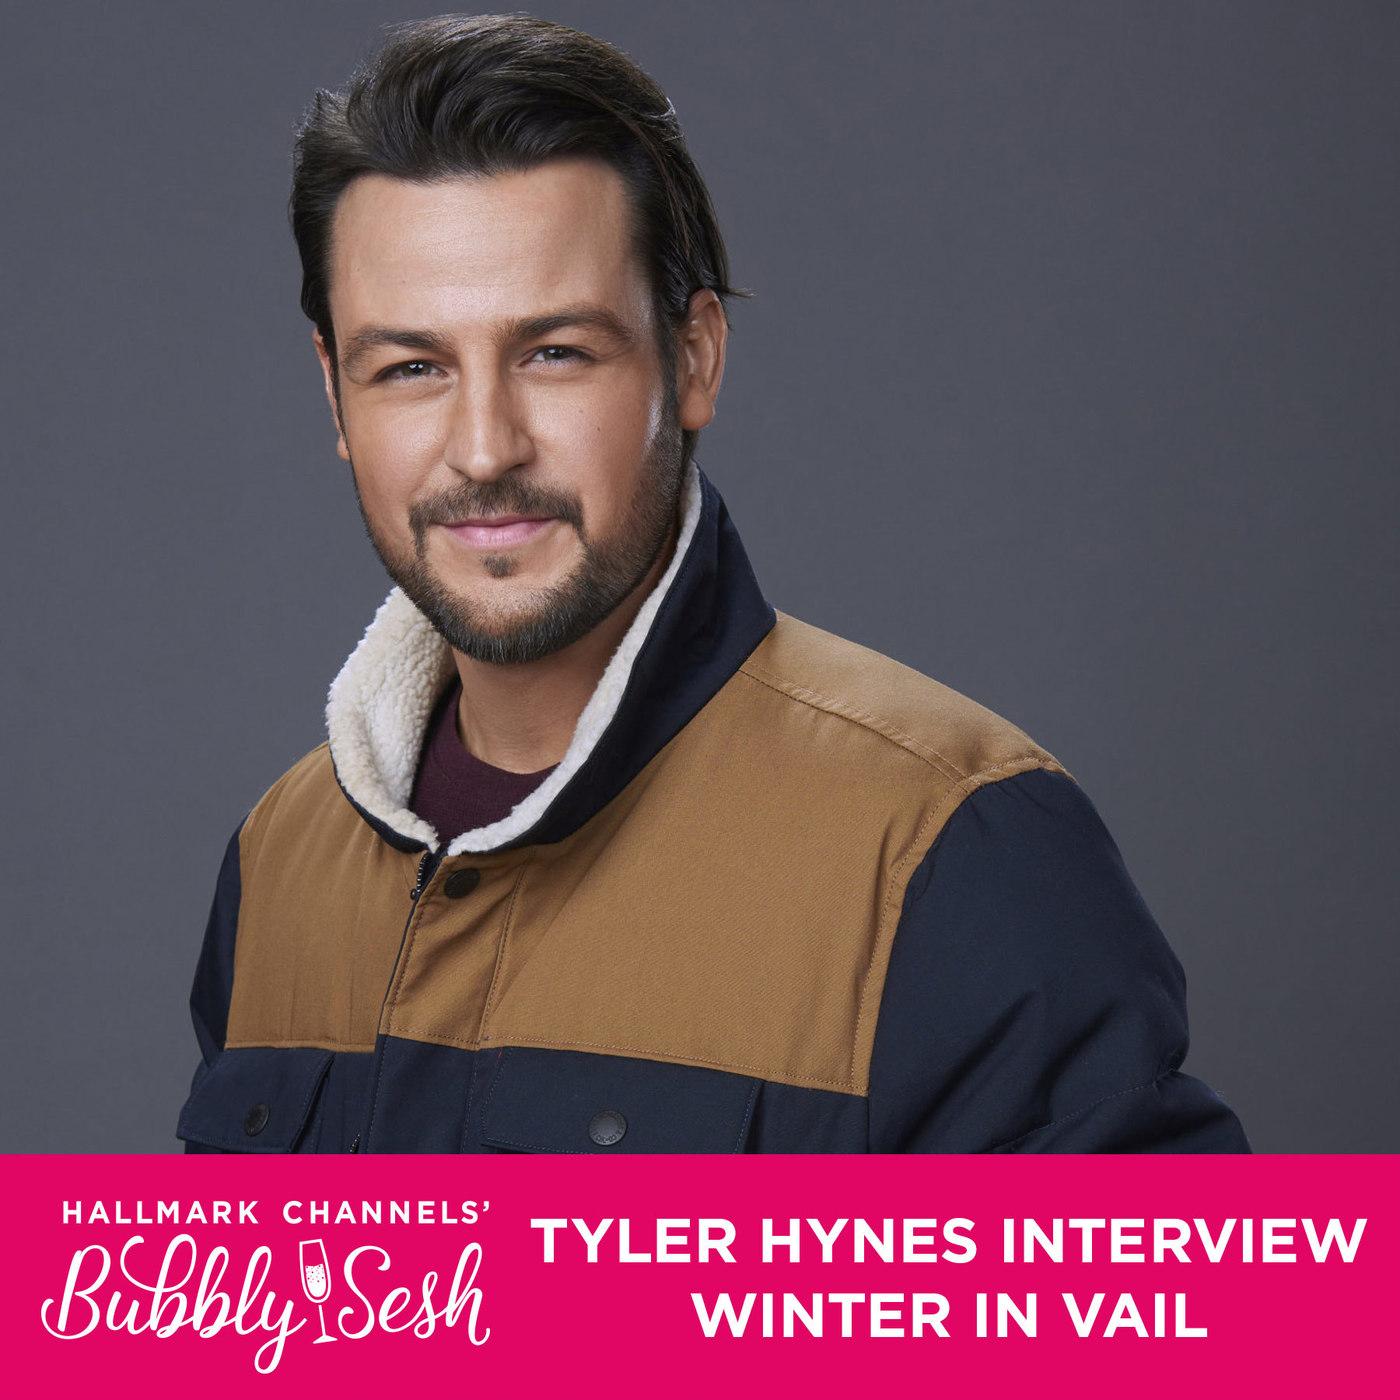 Tyler Hynes Interview, Winter in Vail